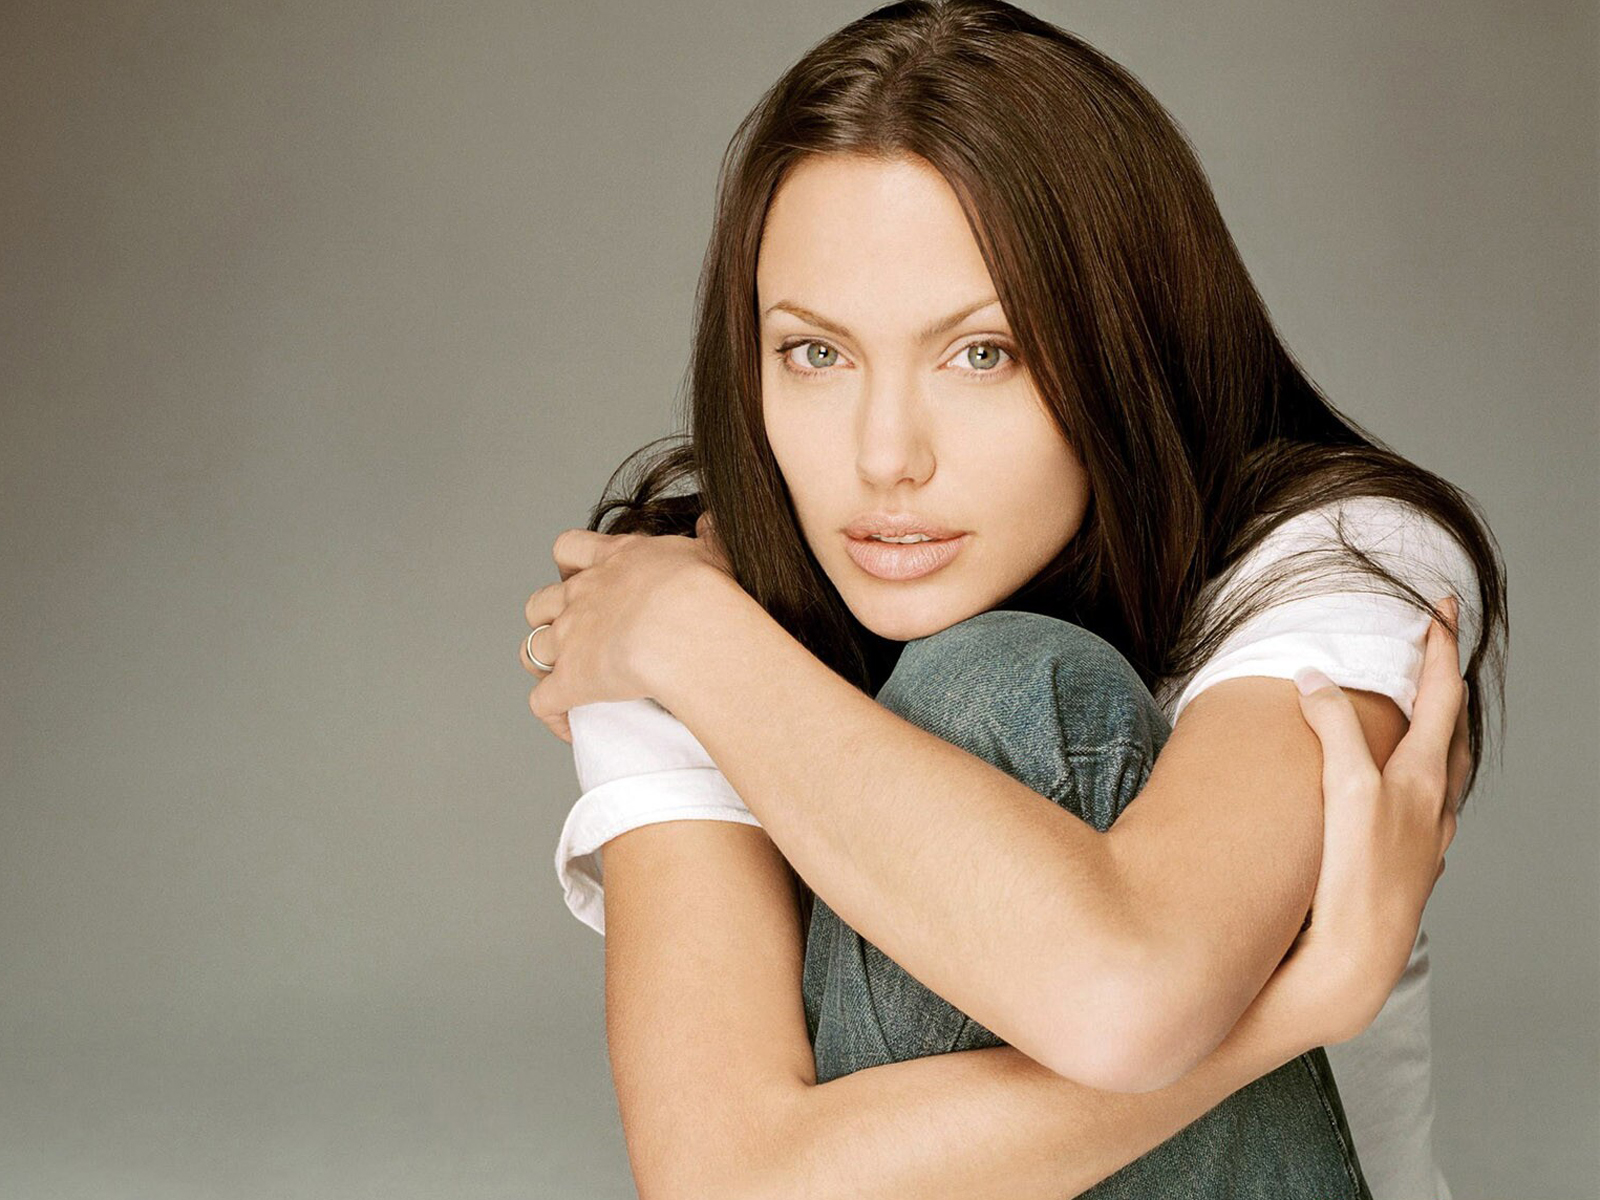 http://2.bp.blogspot.com/-94vhM6OQK1U/TxmFJr8rXWI/AAAAAAAABZ8/aLHfkPS-BTo/s1600/Angelina-Jolie-Wallpapers-Widescreen-4.jpg